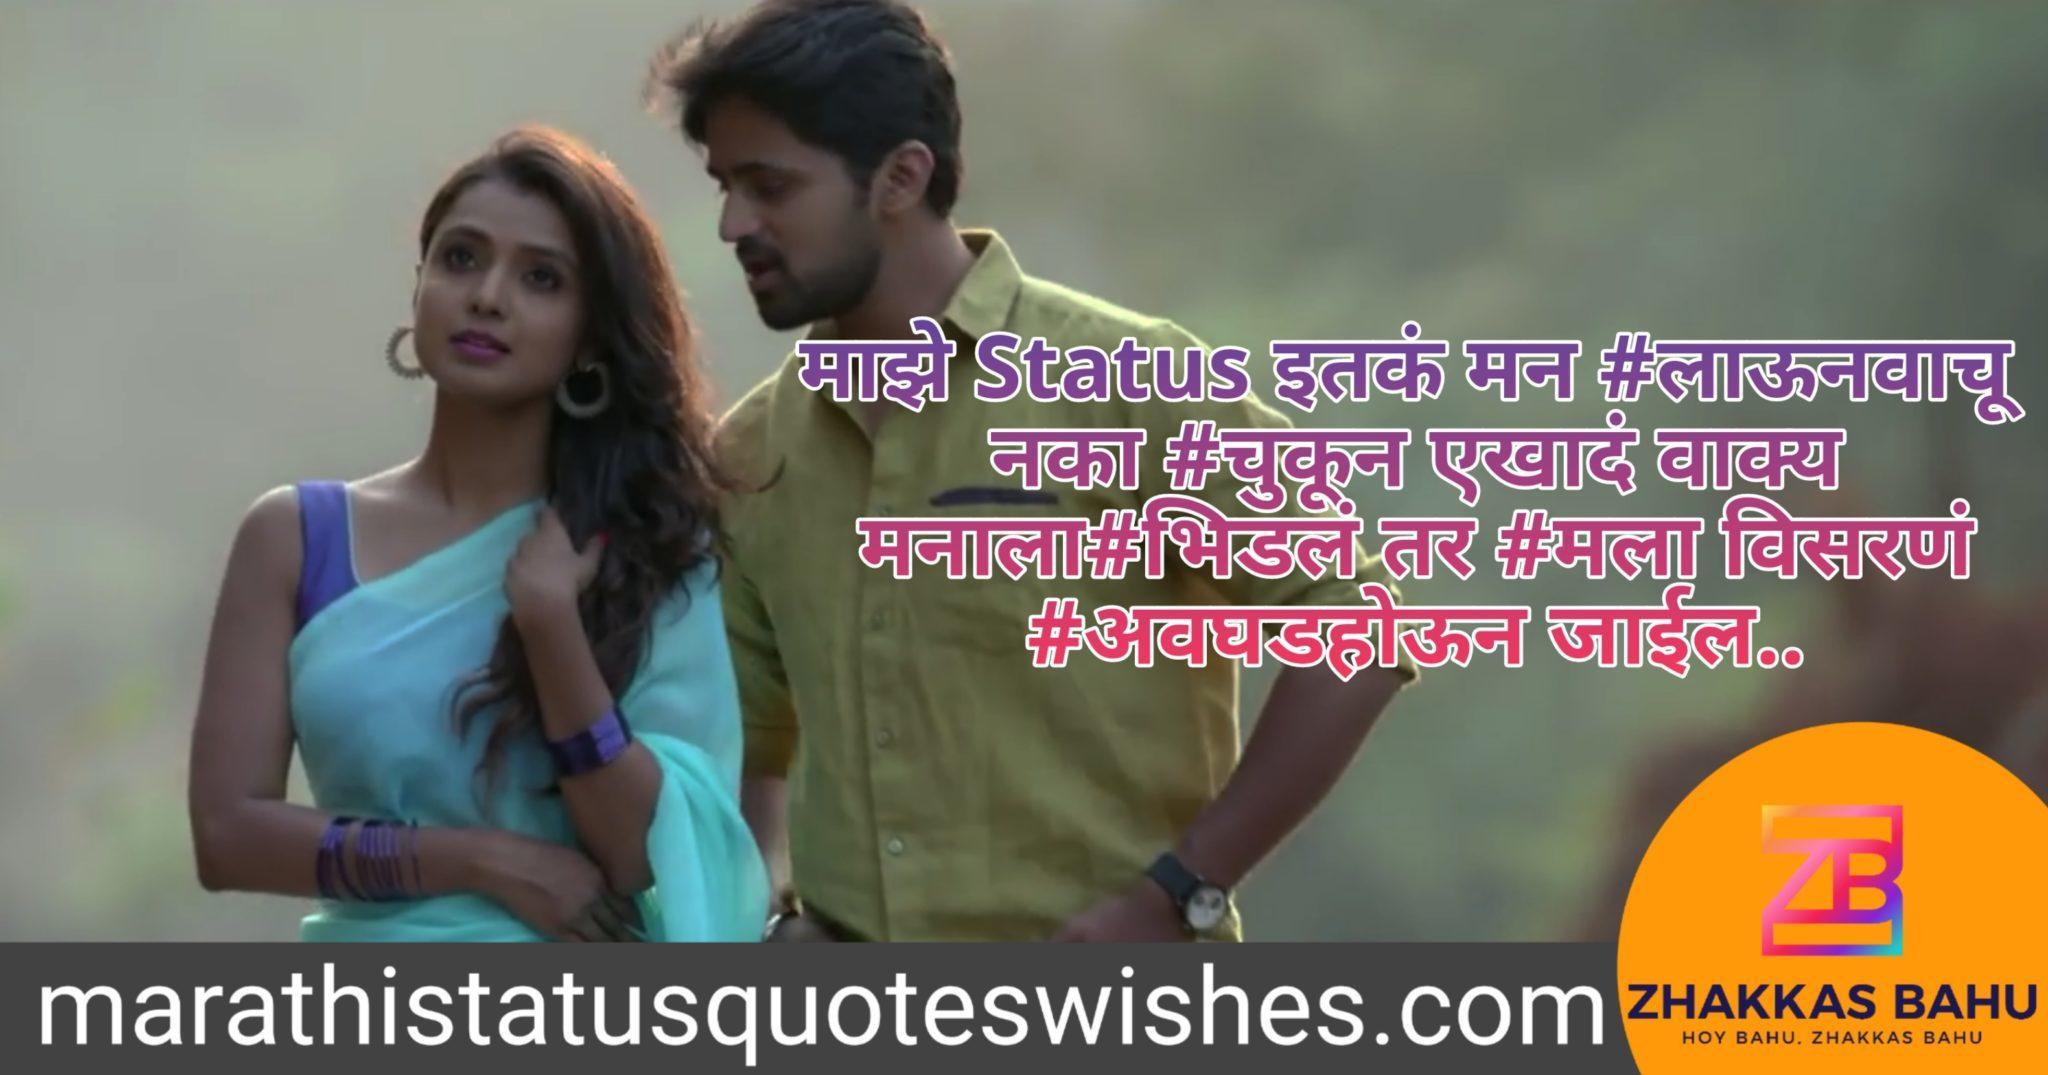 Sad Love Images in Marathi, Marathi Love Images New,